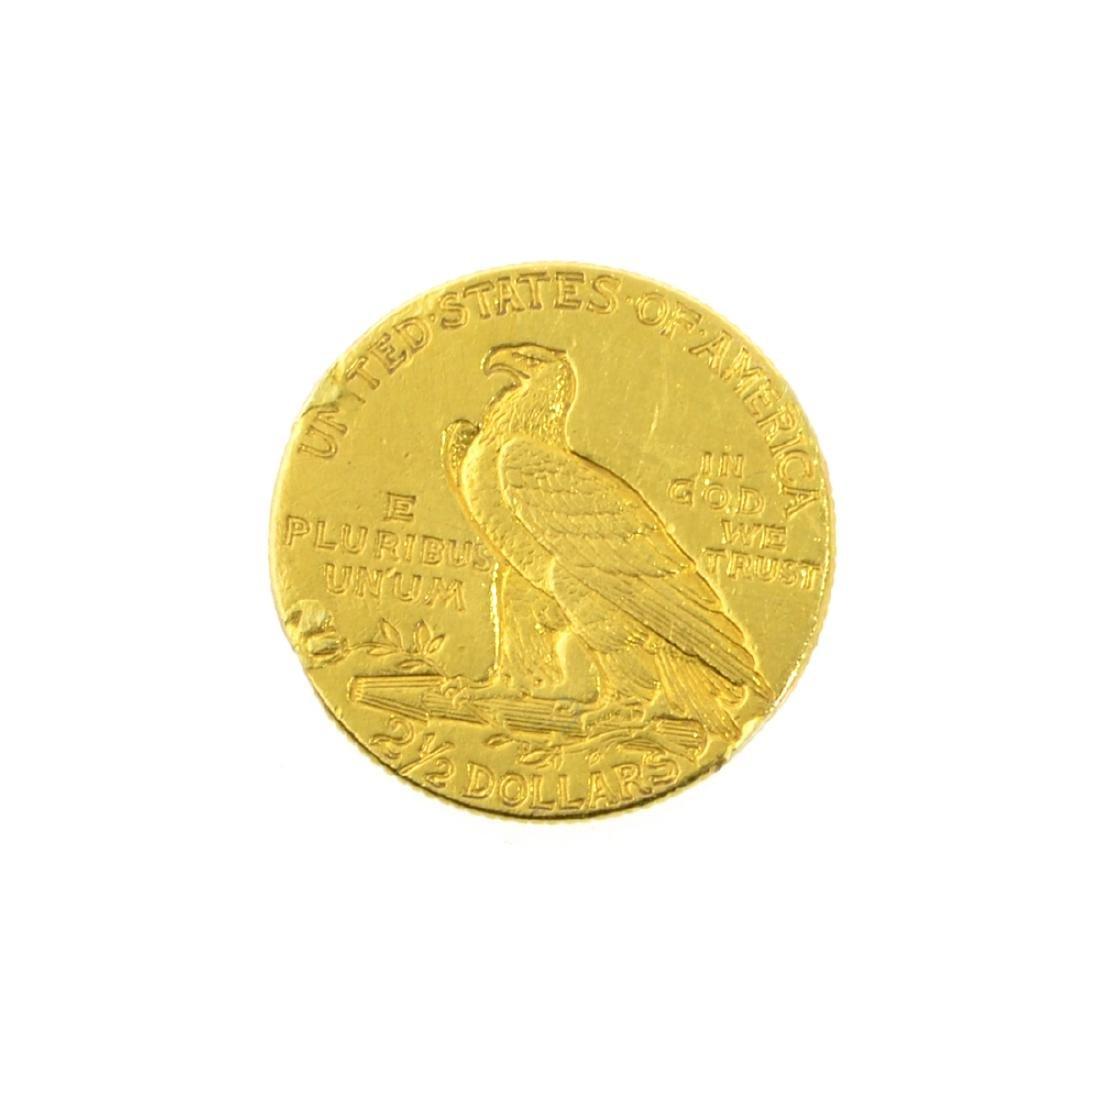 *1912 $2.50 U.S. Indian Head Gold Coin (JG-JWJ) - 2